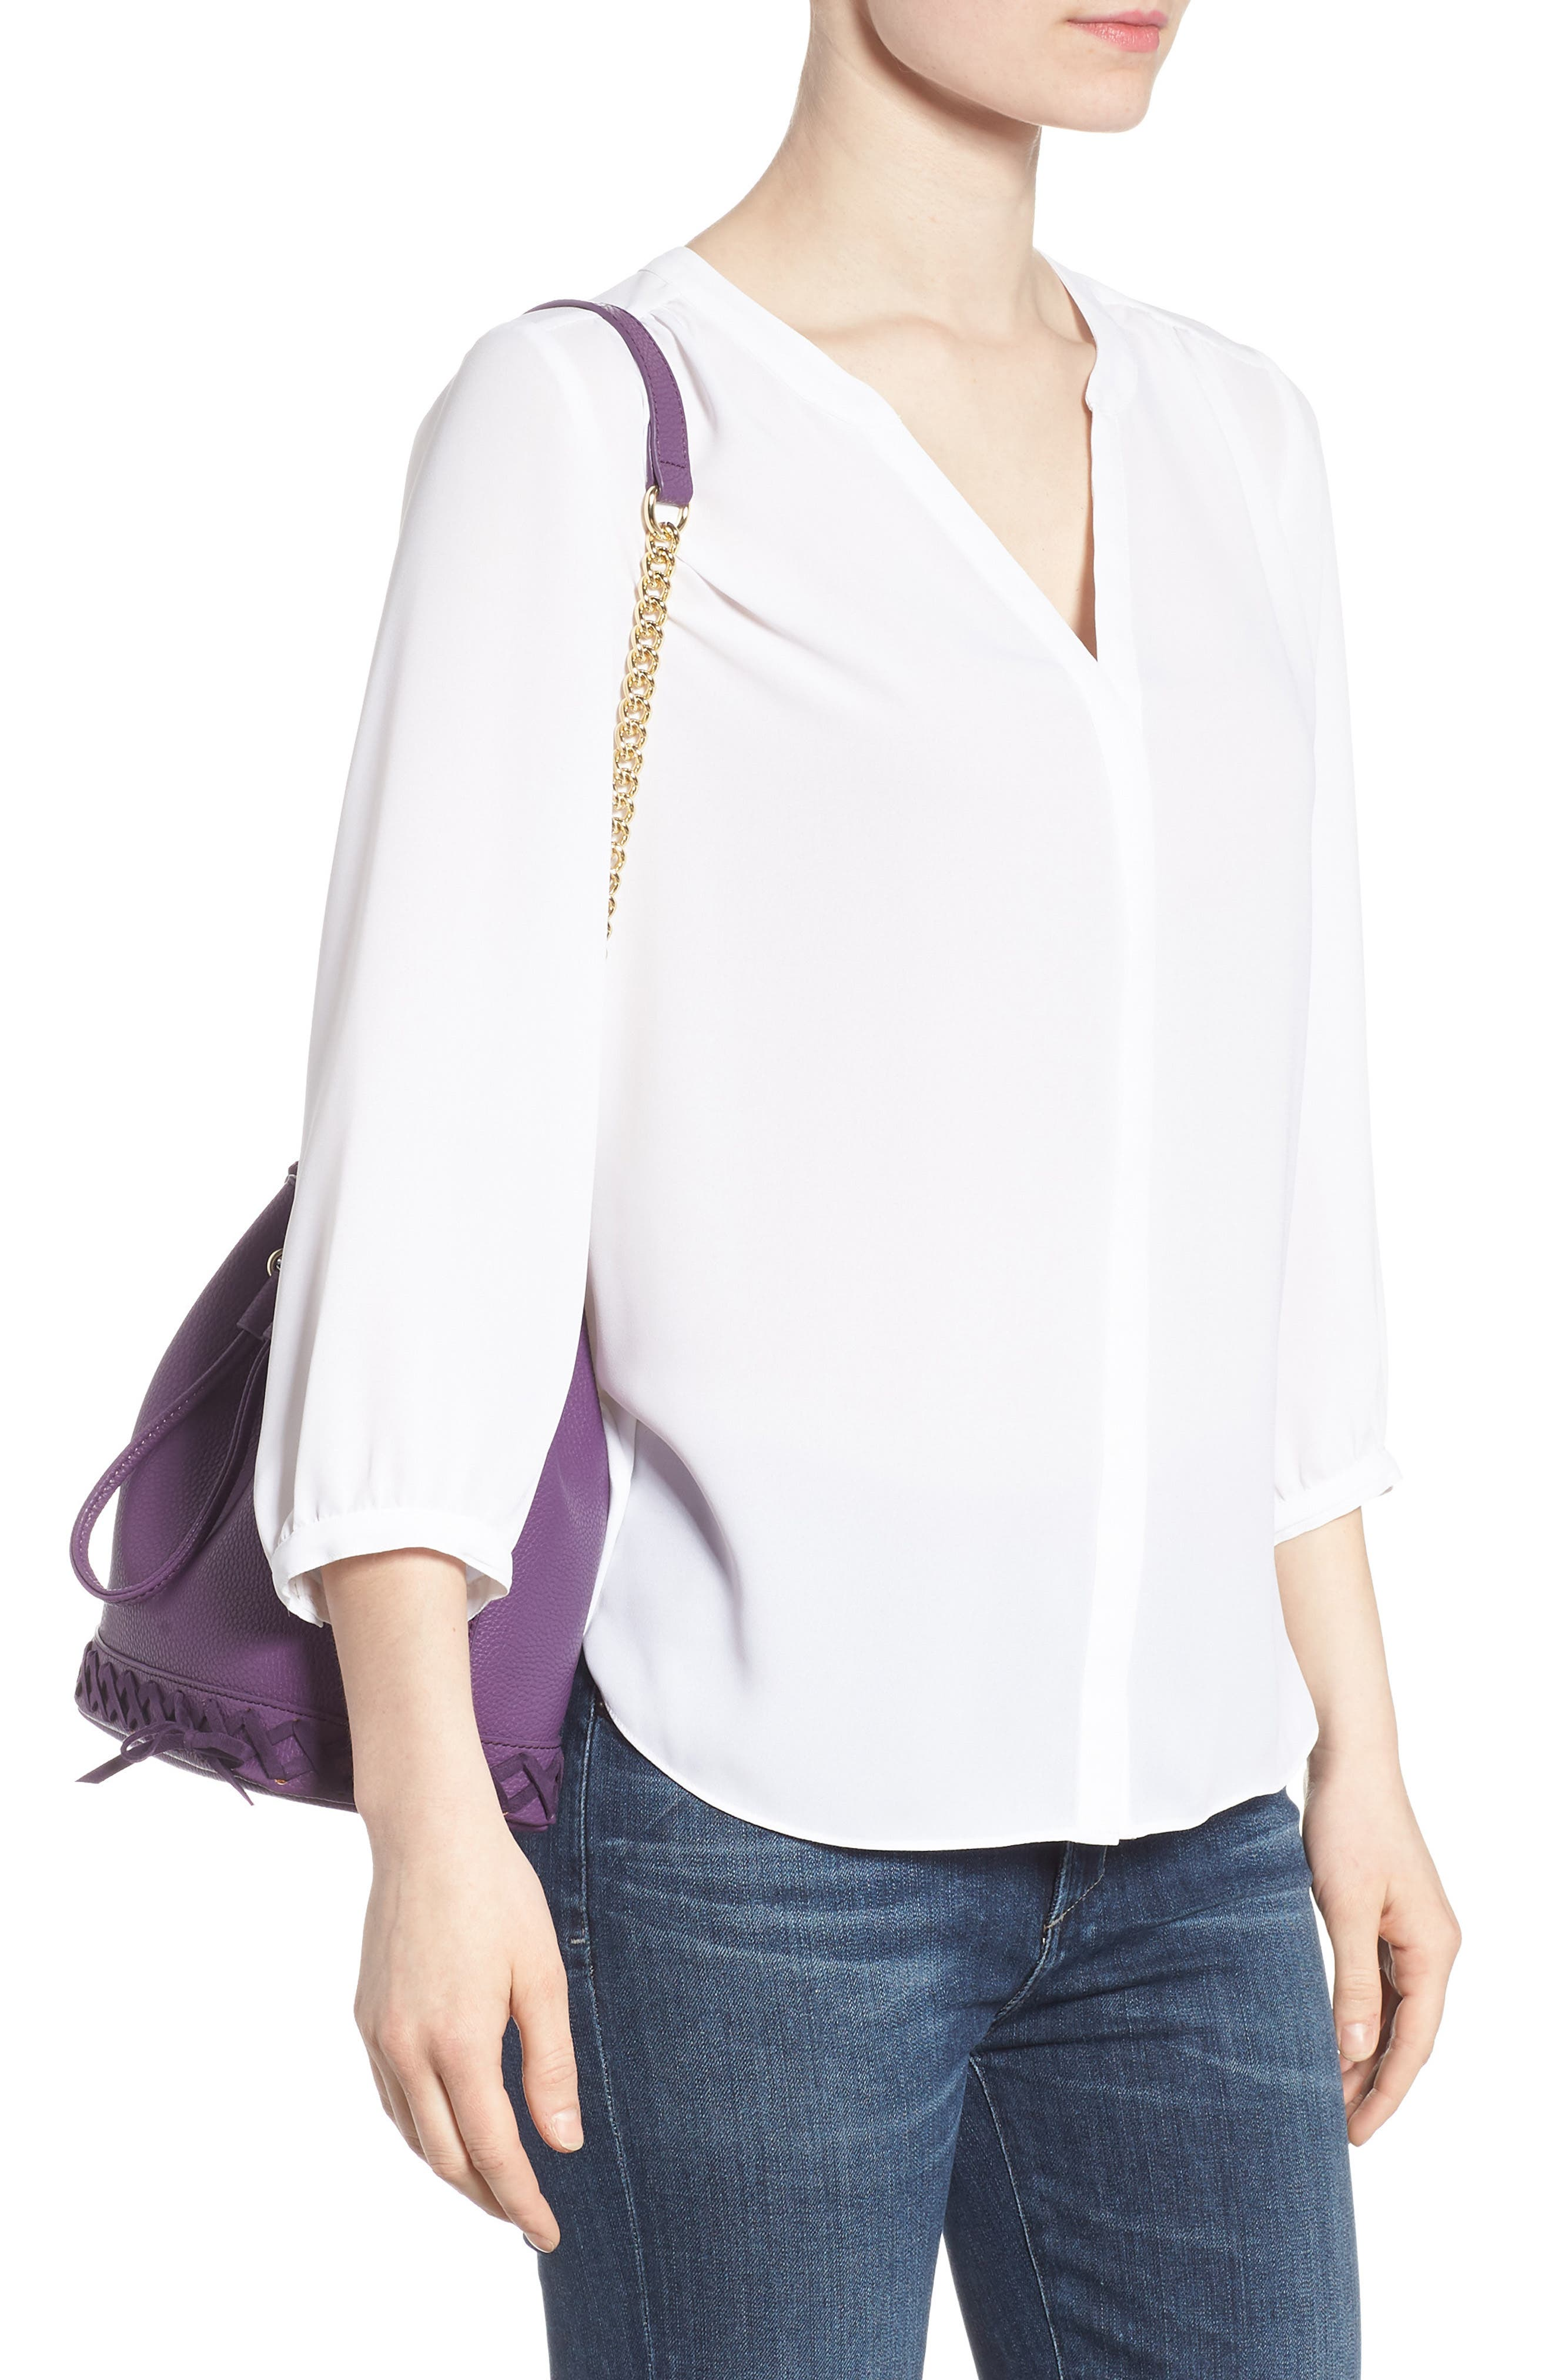 Veronica Faux Leather Bucket Bag,                             Alternate thumbnail 2, color,                             Purple